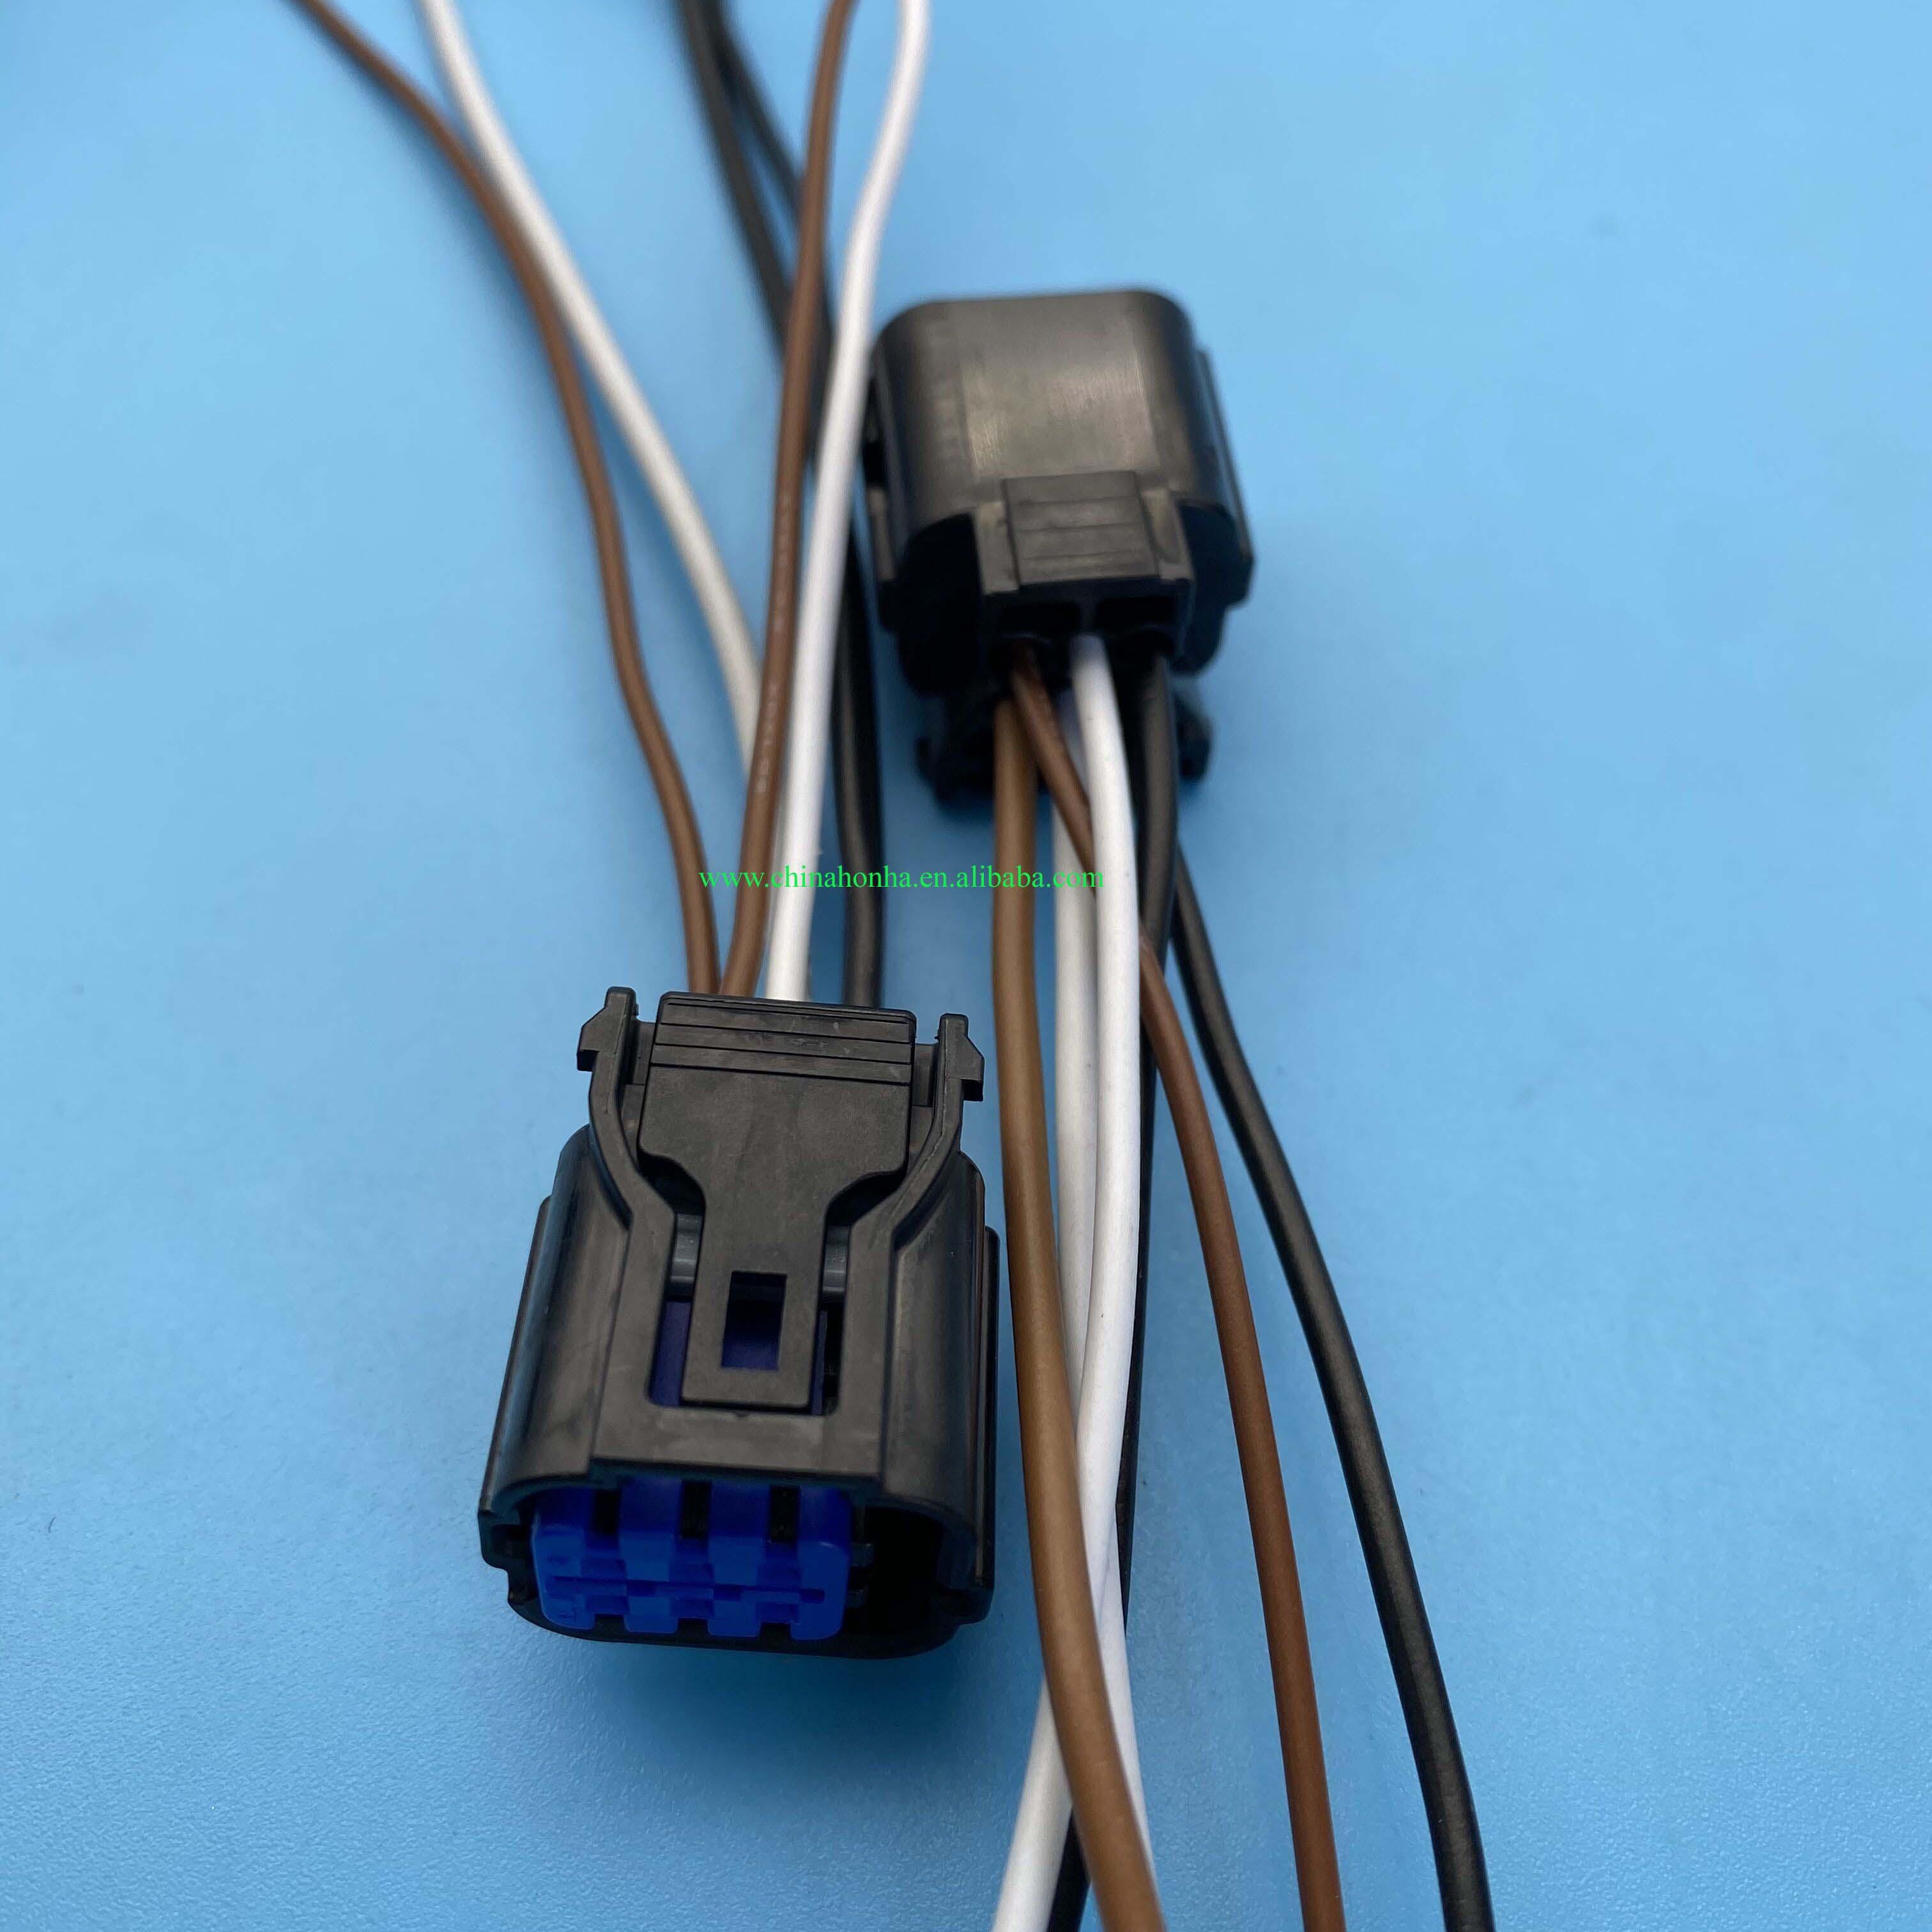 6 pin car waterproof plug connector HP285-06021